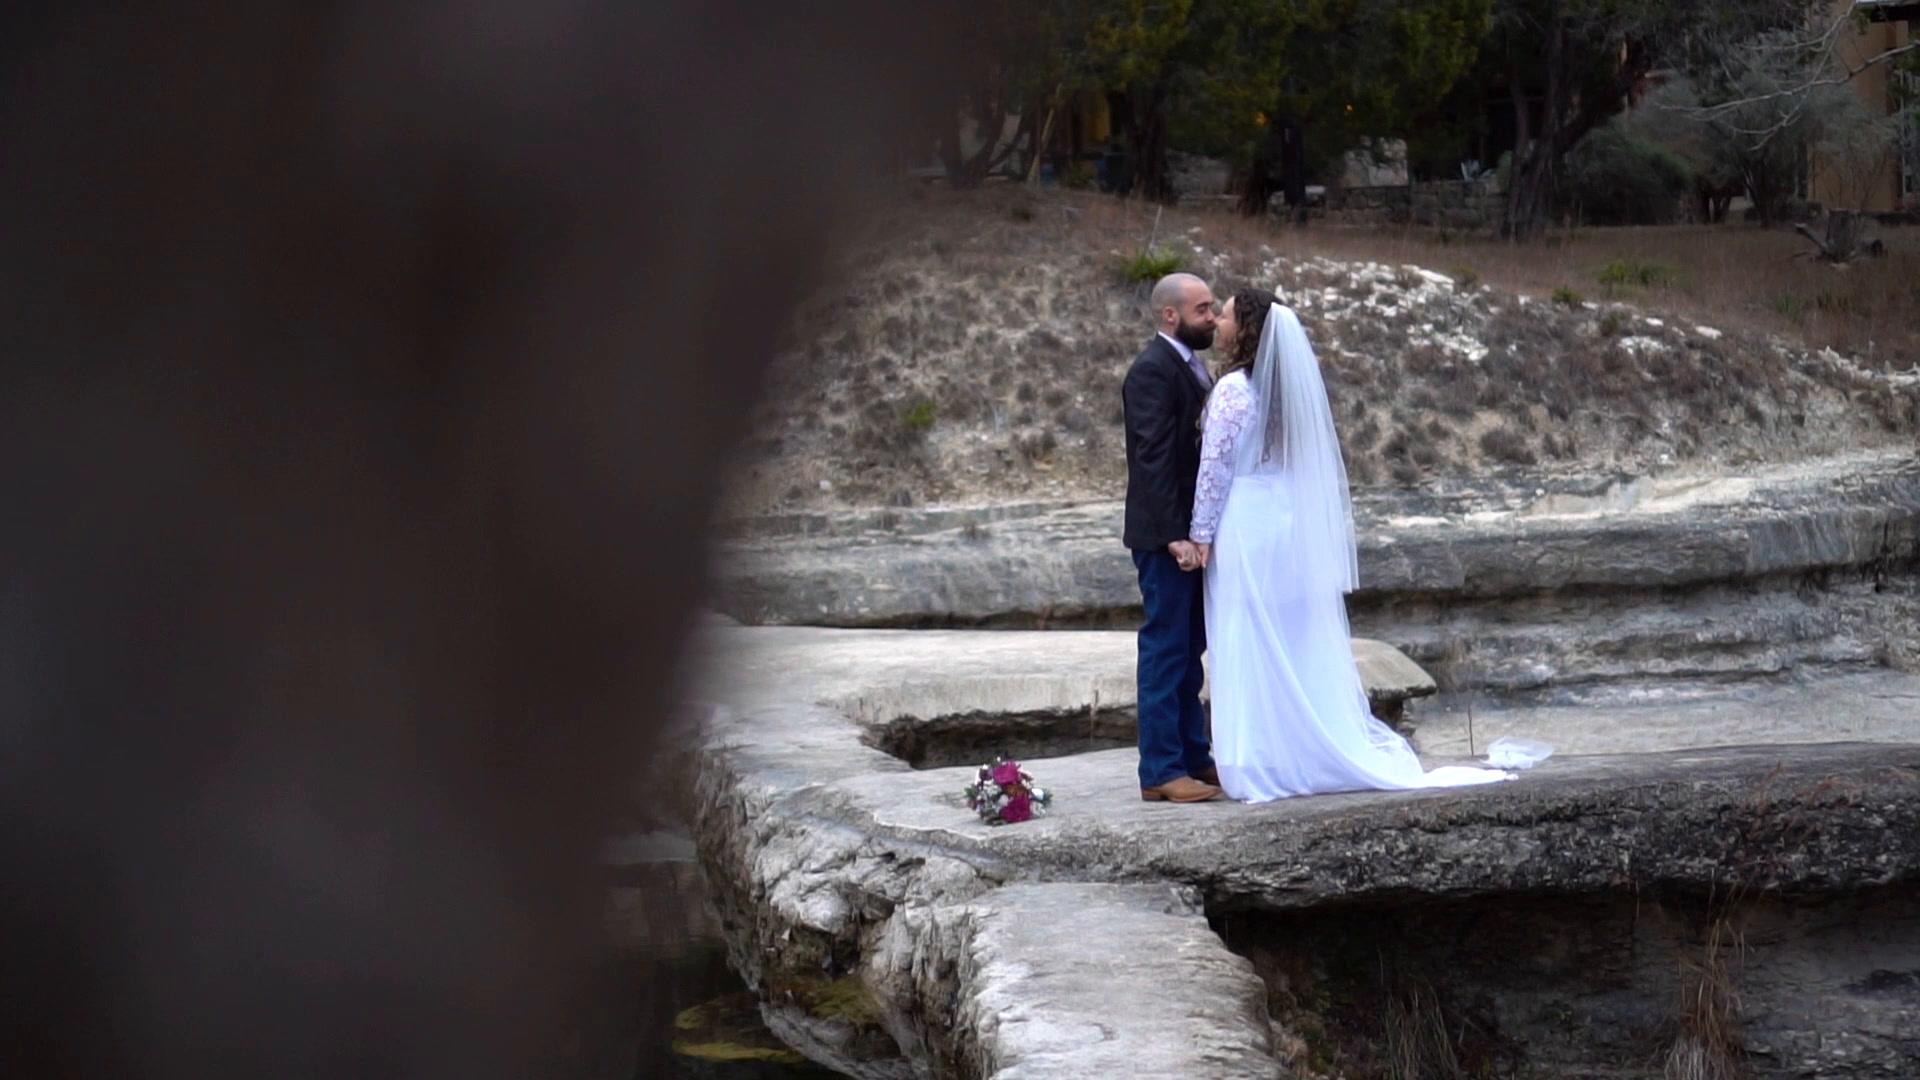 Karina + Jacob | Wimberley, Texas | A Barn